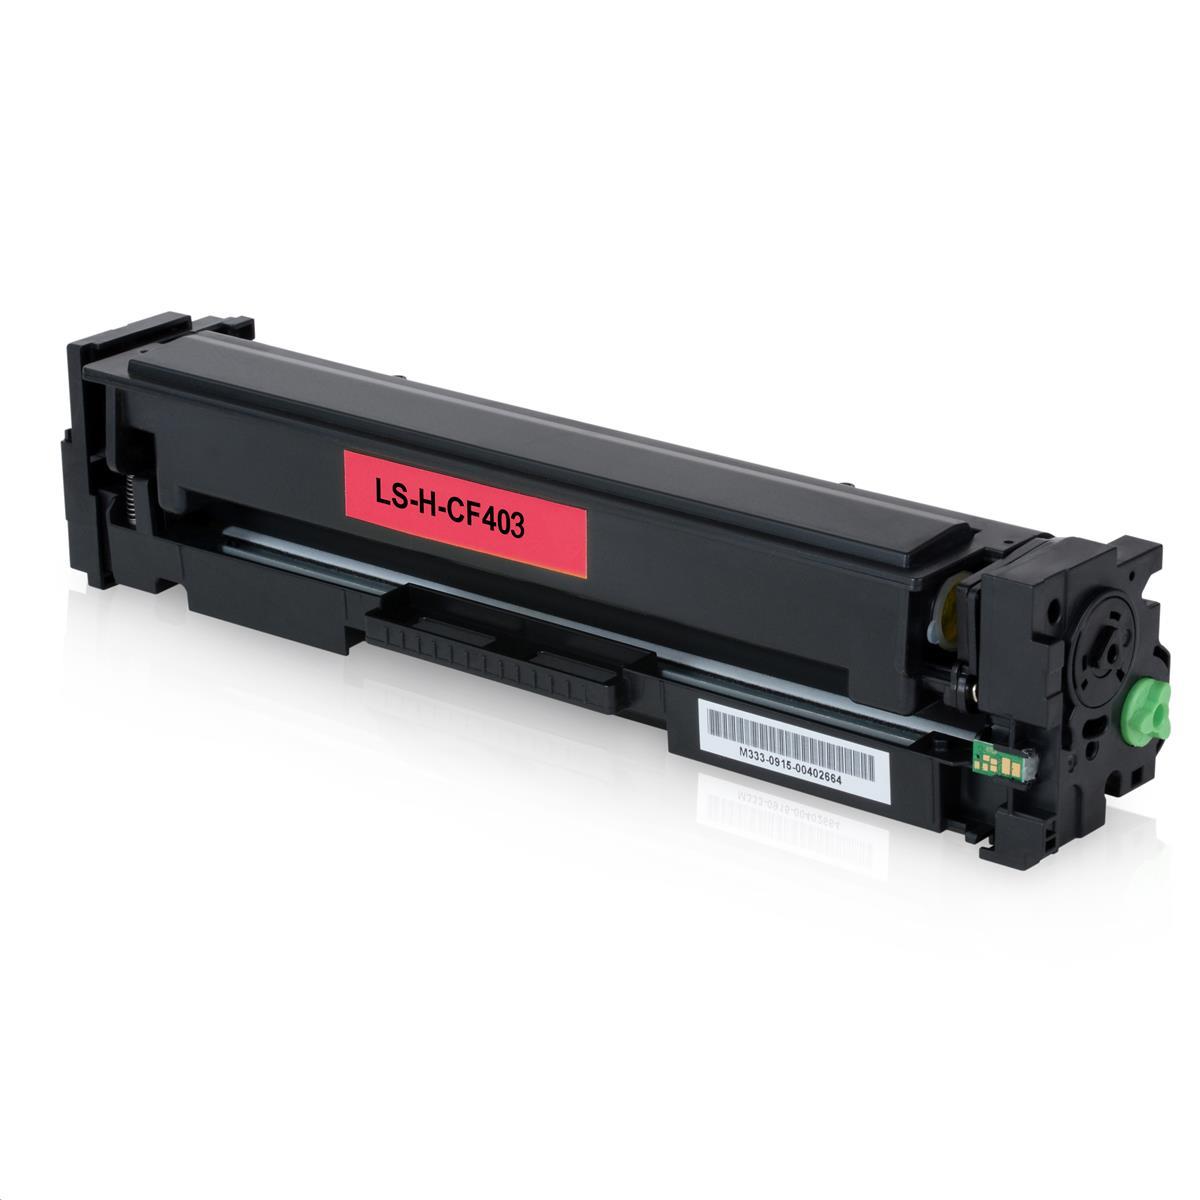 Toner HP CF403A Magenta 201A Compatível | M252DW M252 M277DW M277 | Importado